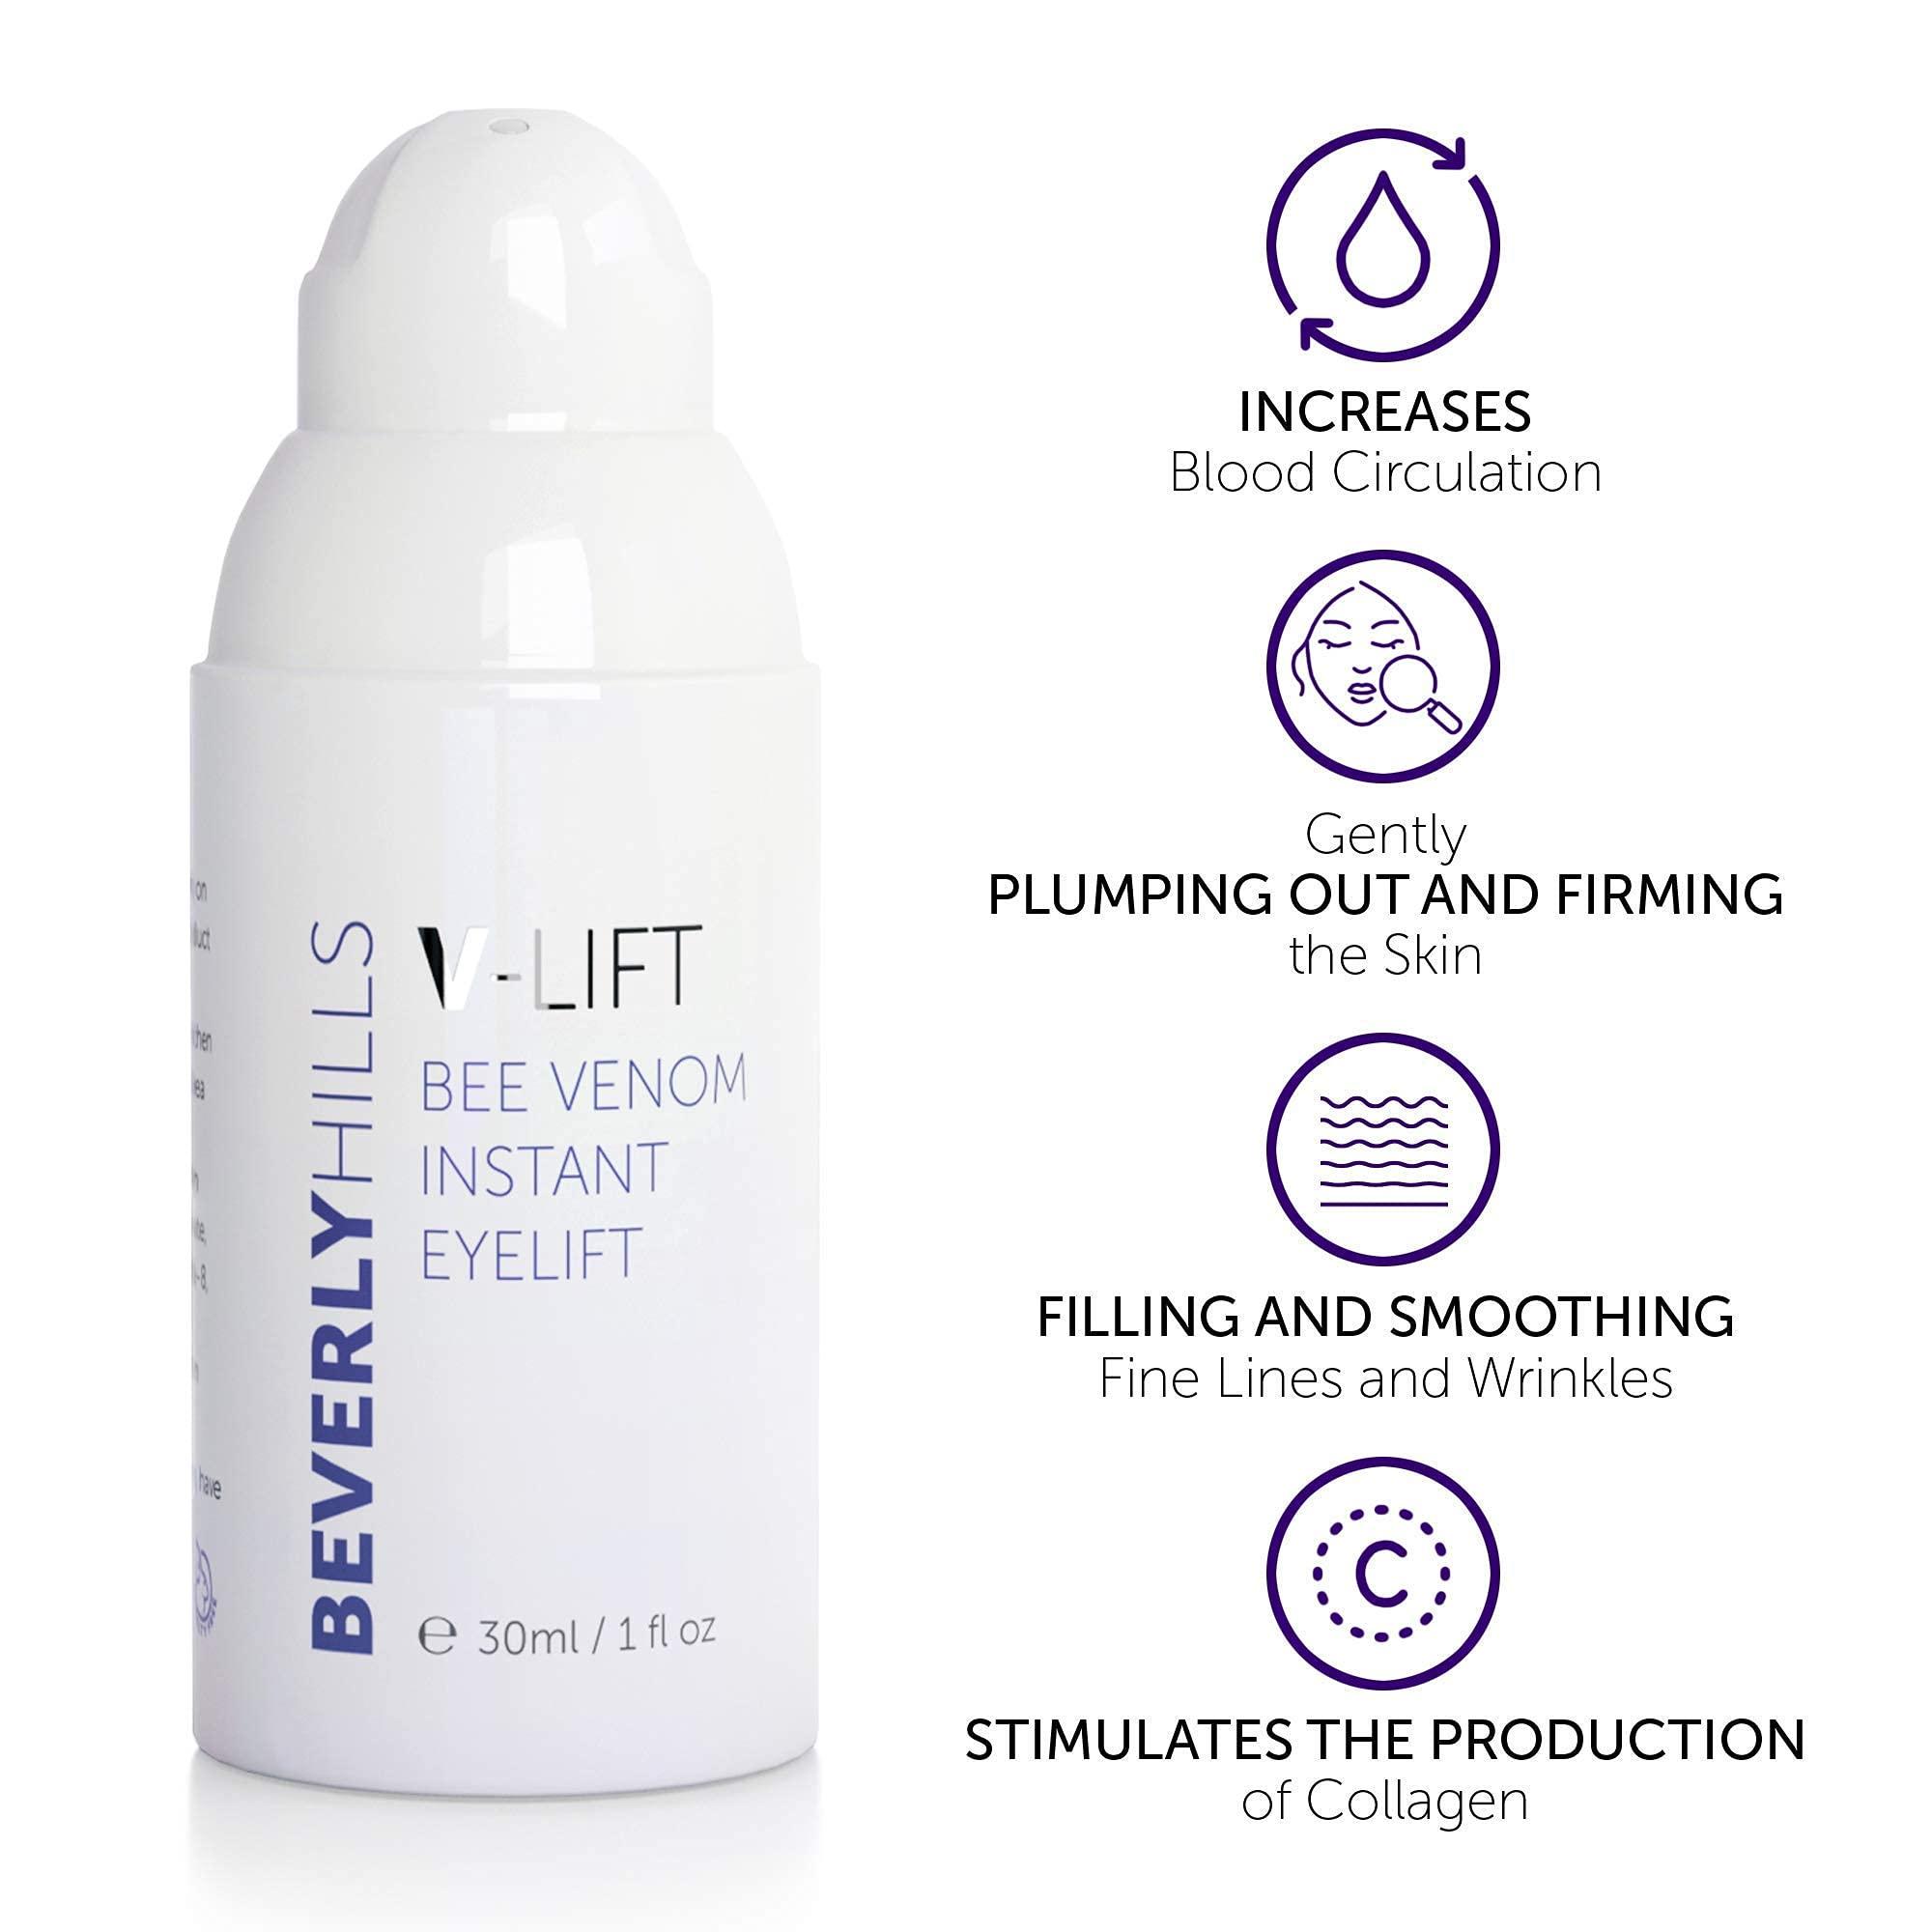 BEVERLY HILLS V-Lift Instant Eye Lift and Eye Tuck Bee Venom Serum for Treating Puffy Eyes, Dark Circles, and Wrinkles